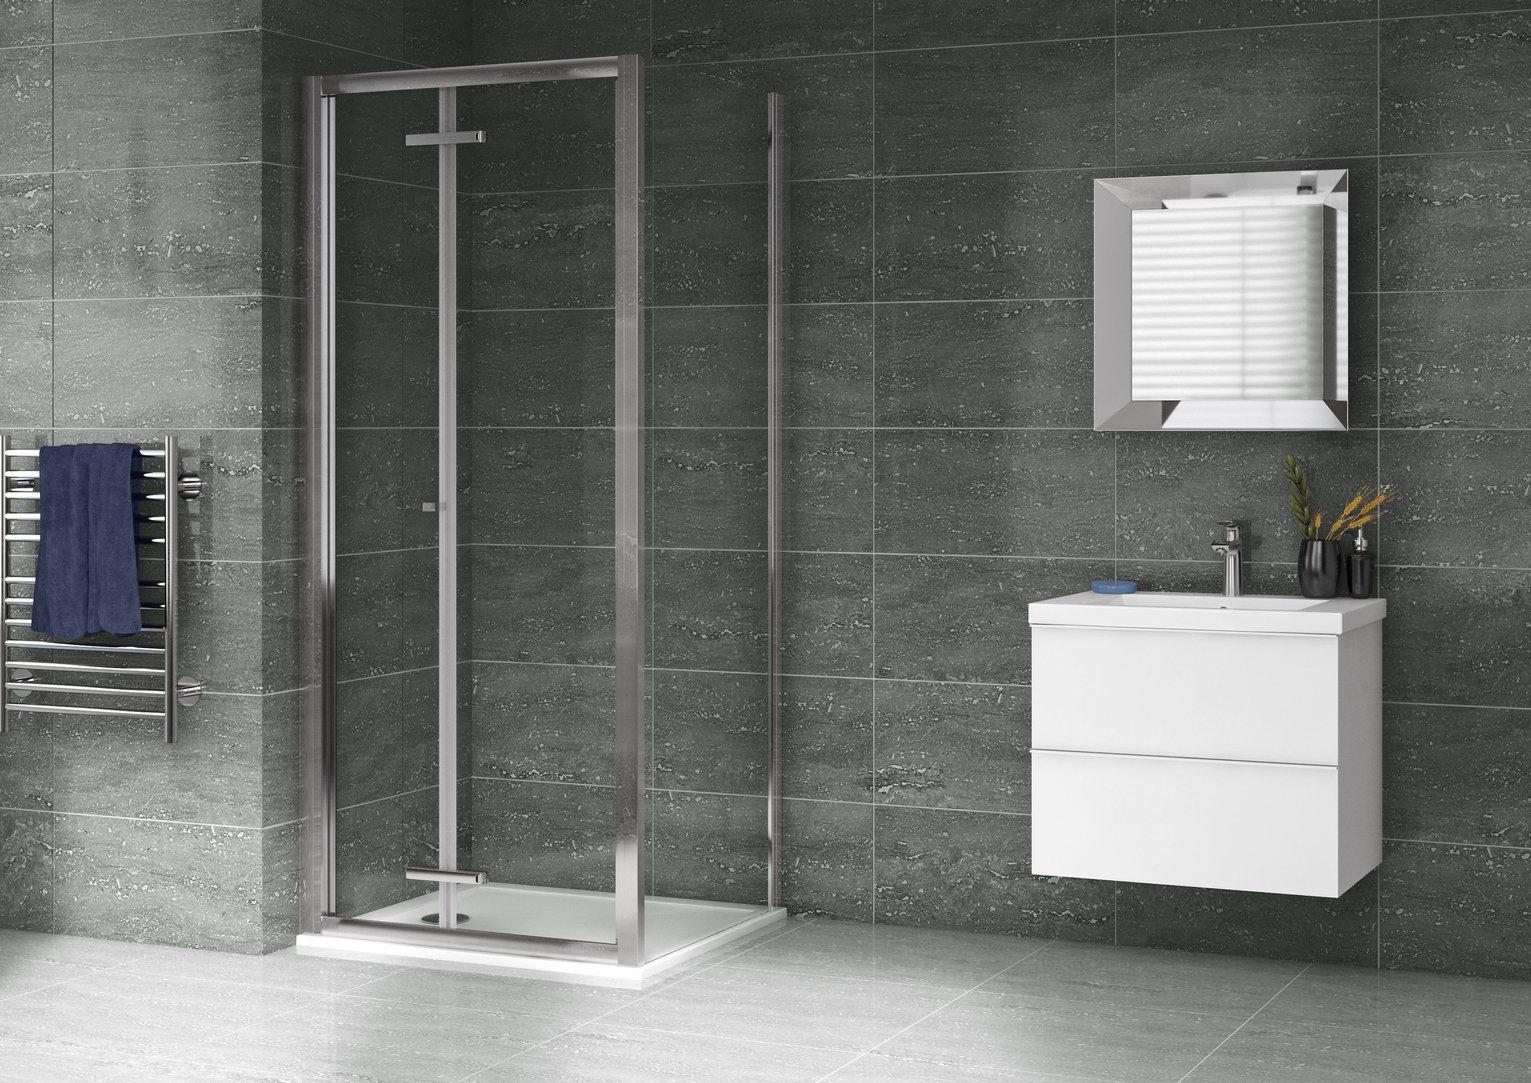 Aqualux 900mm x 900mm Bi-Fold Shower Enclosure & Tray